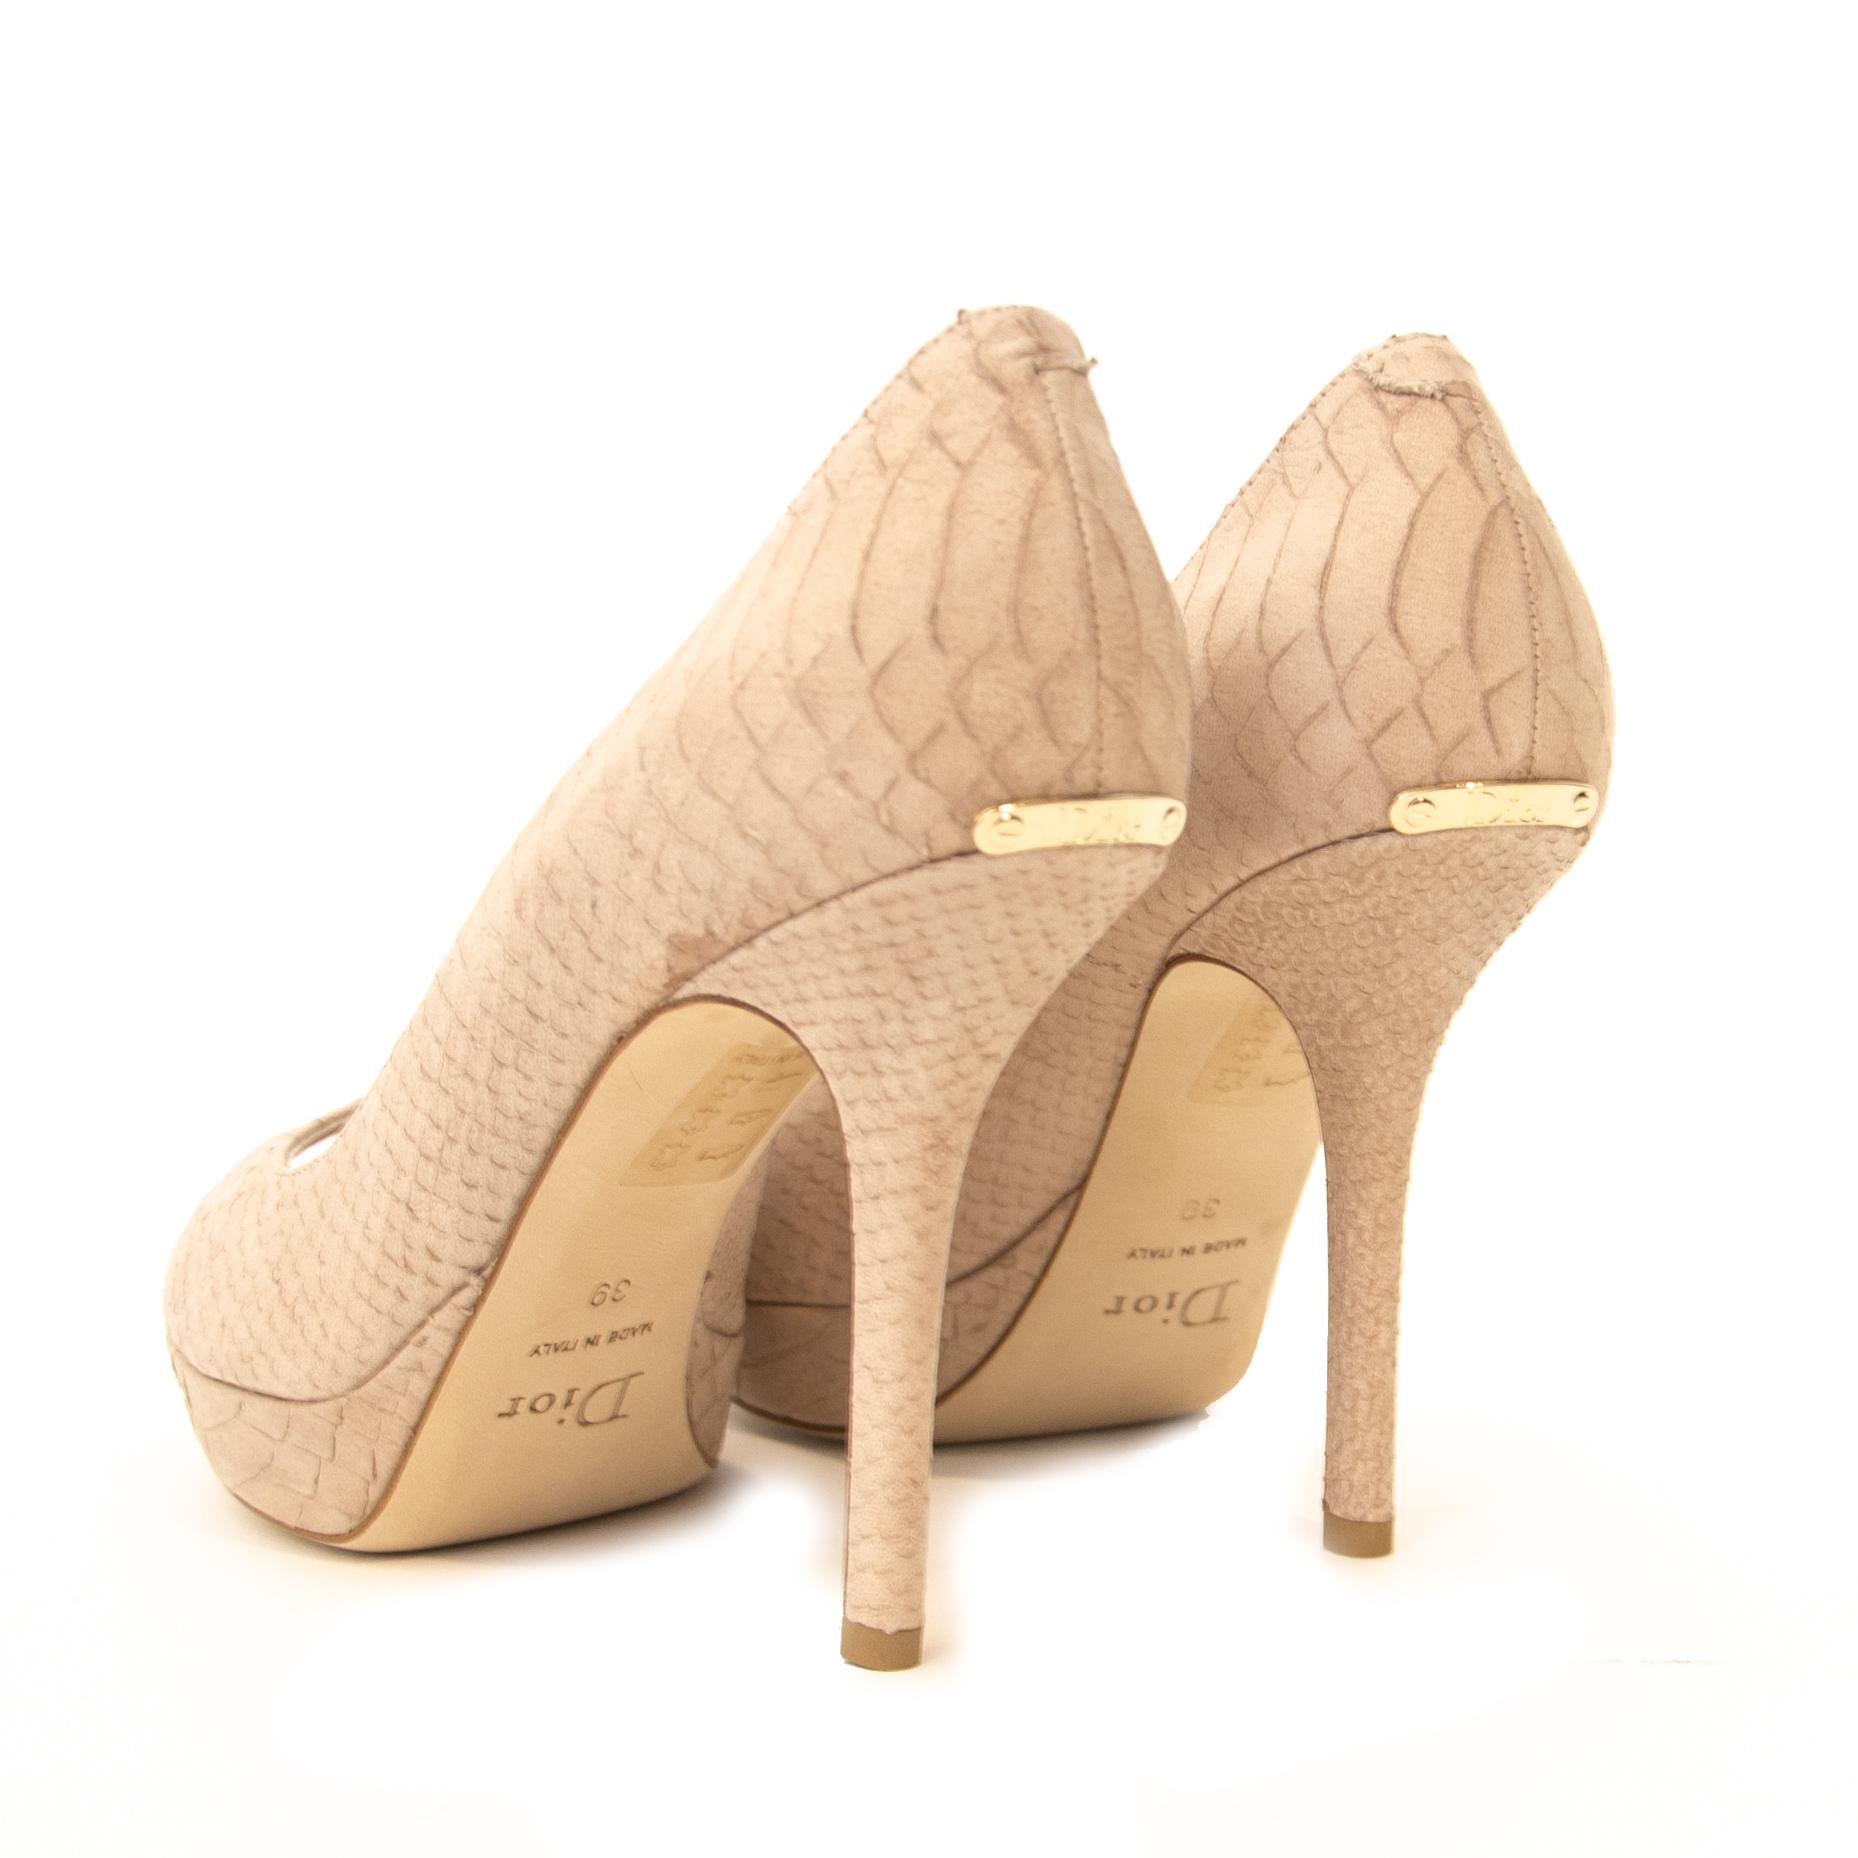 b6d42e6f430 ... Christian Dior Pink Python Peep-Toe Pumps - Size 39 Buy and sell  vintage handbags